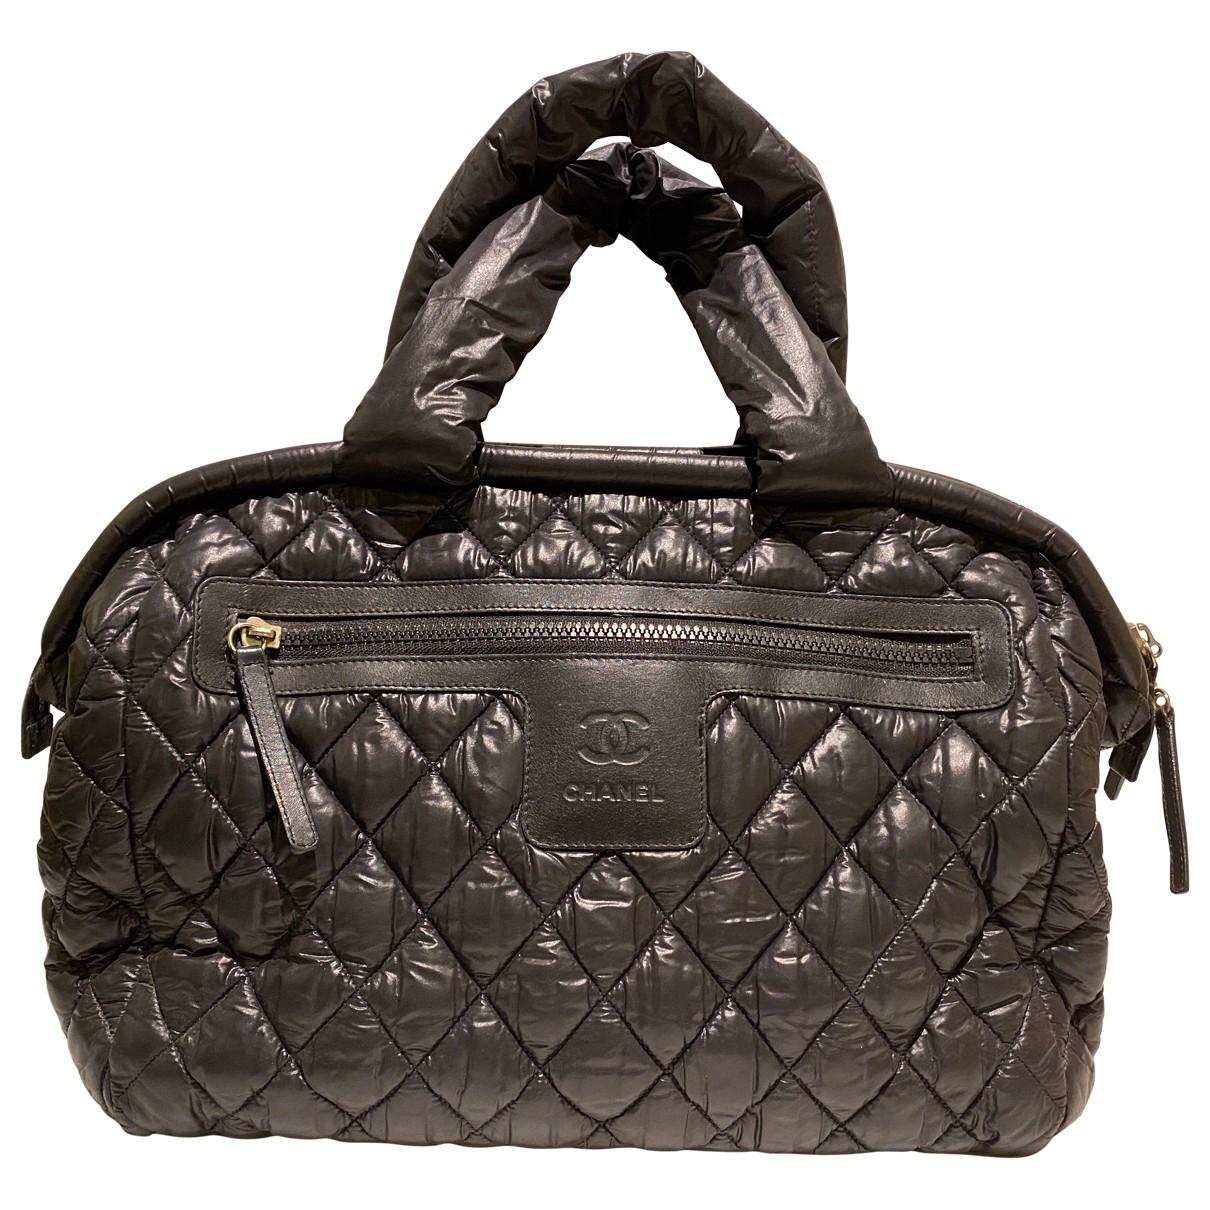 Chanel Coco Cocoon Handtasche in  Schwarz Synthetik